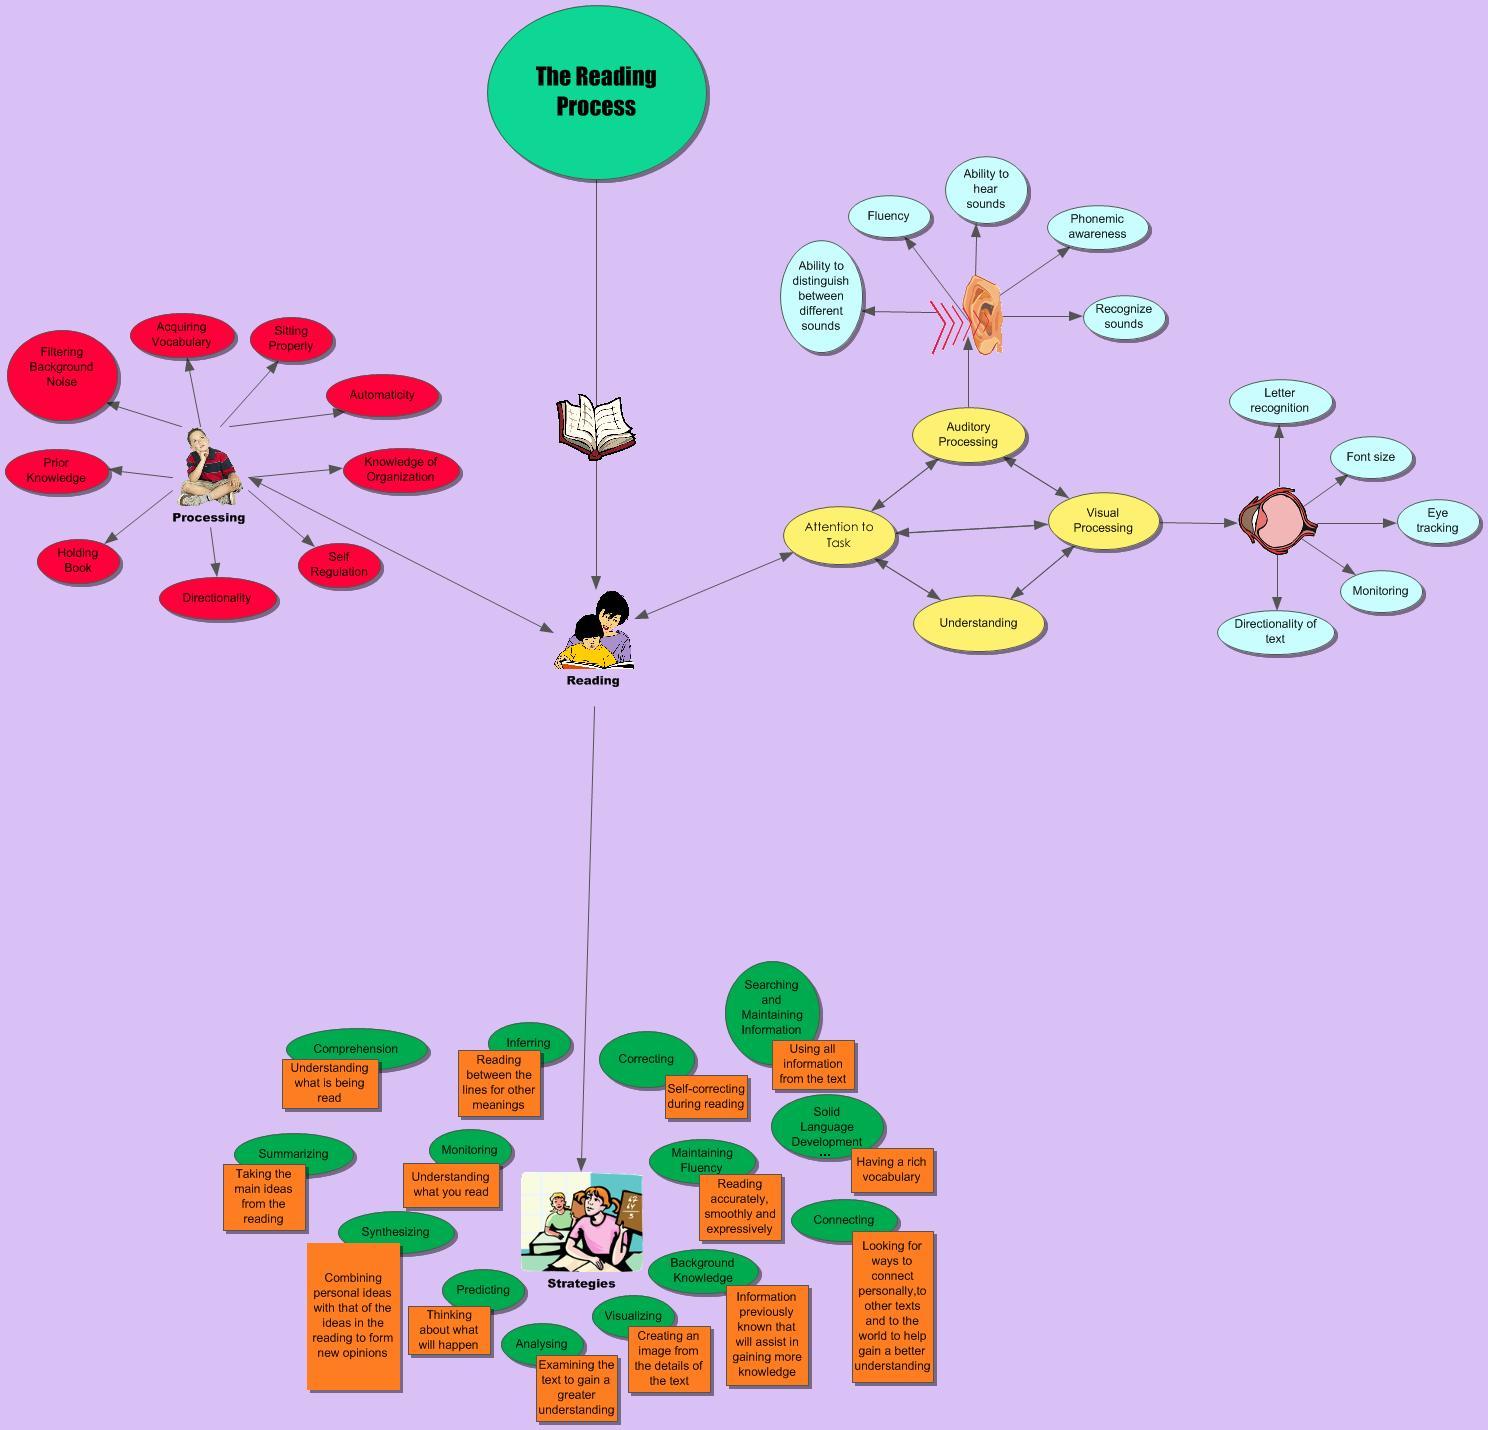 free клетки крови при развитии иммунопатологии 0